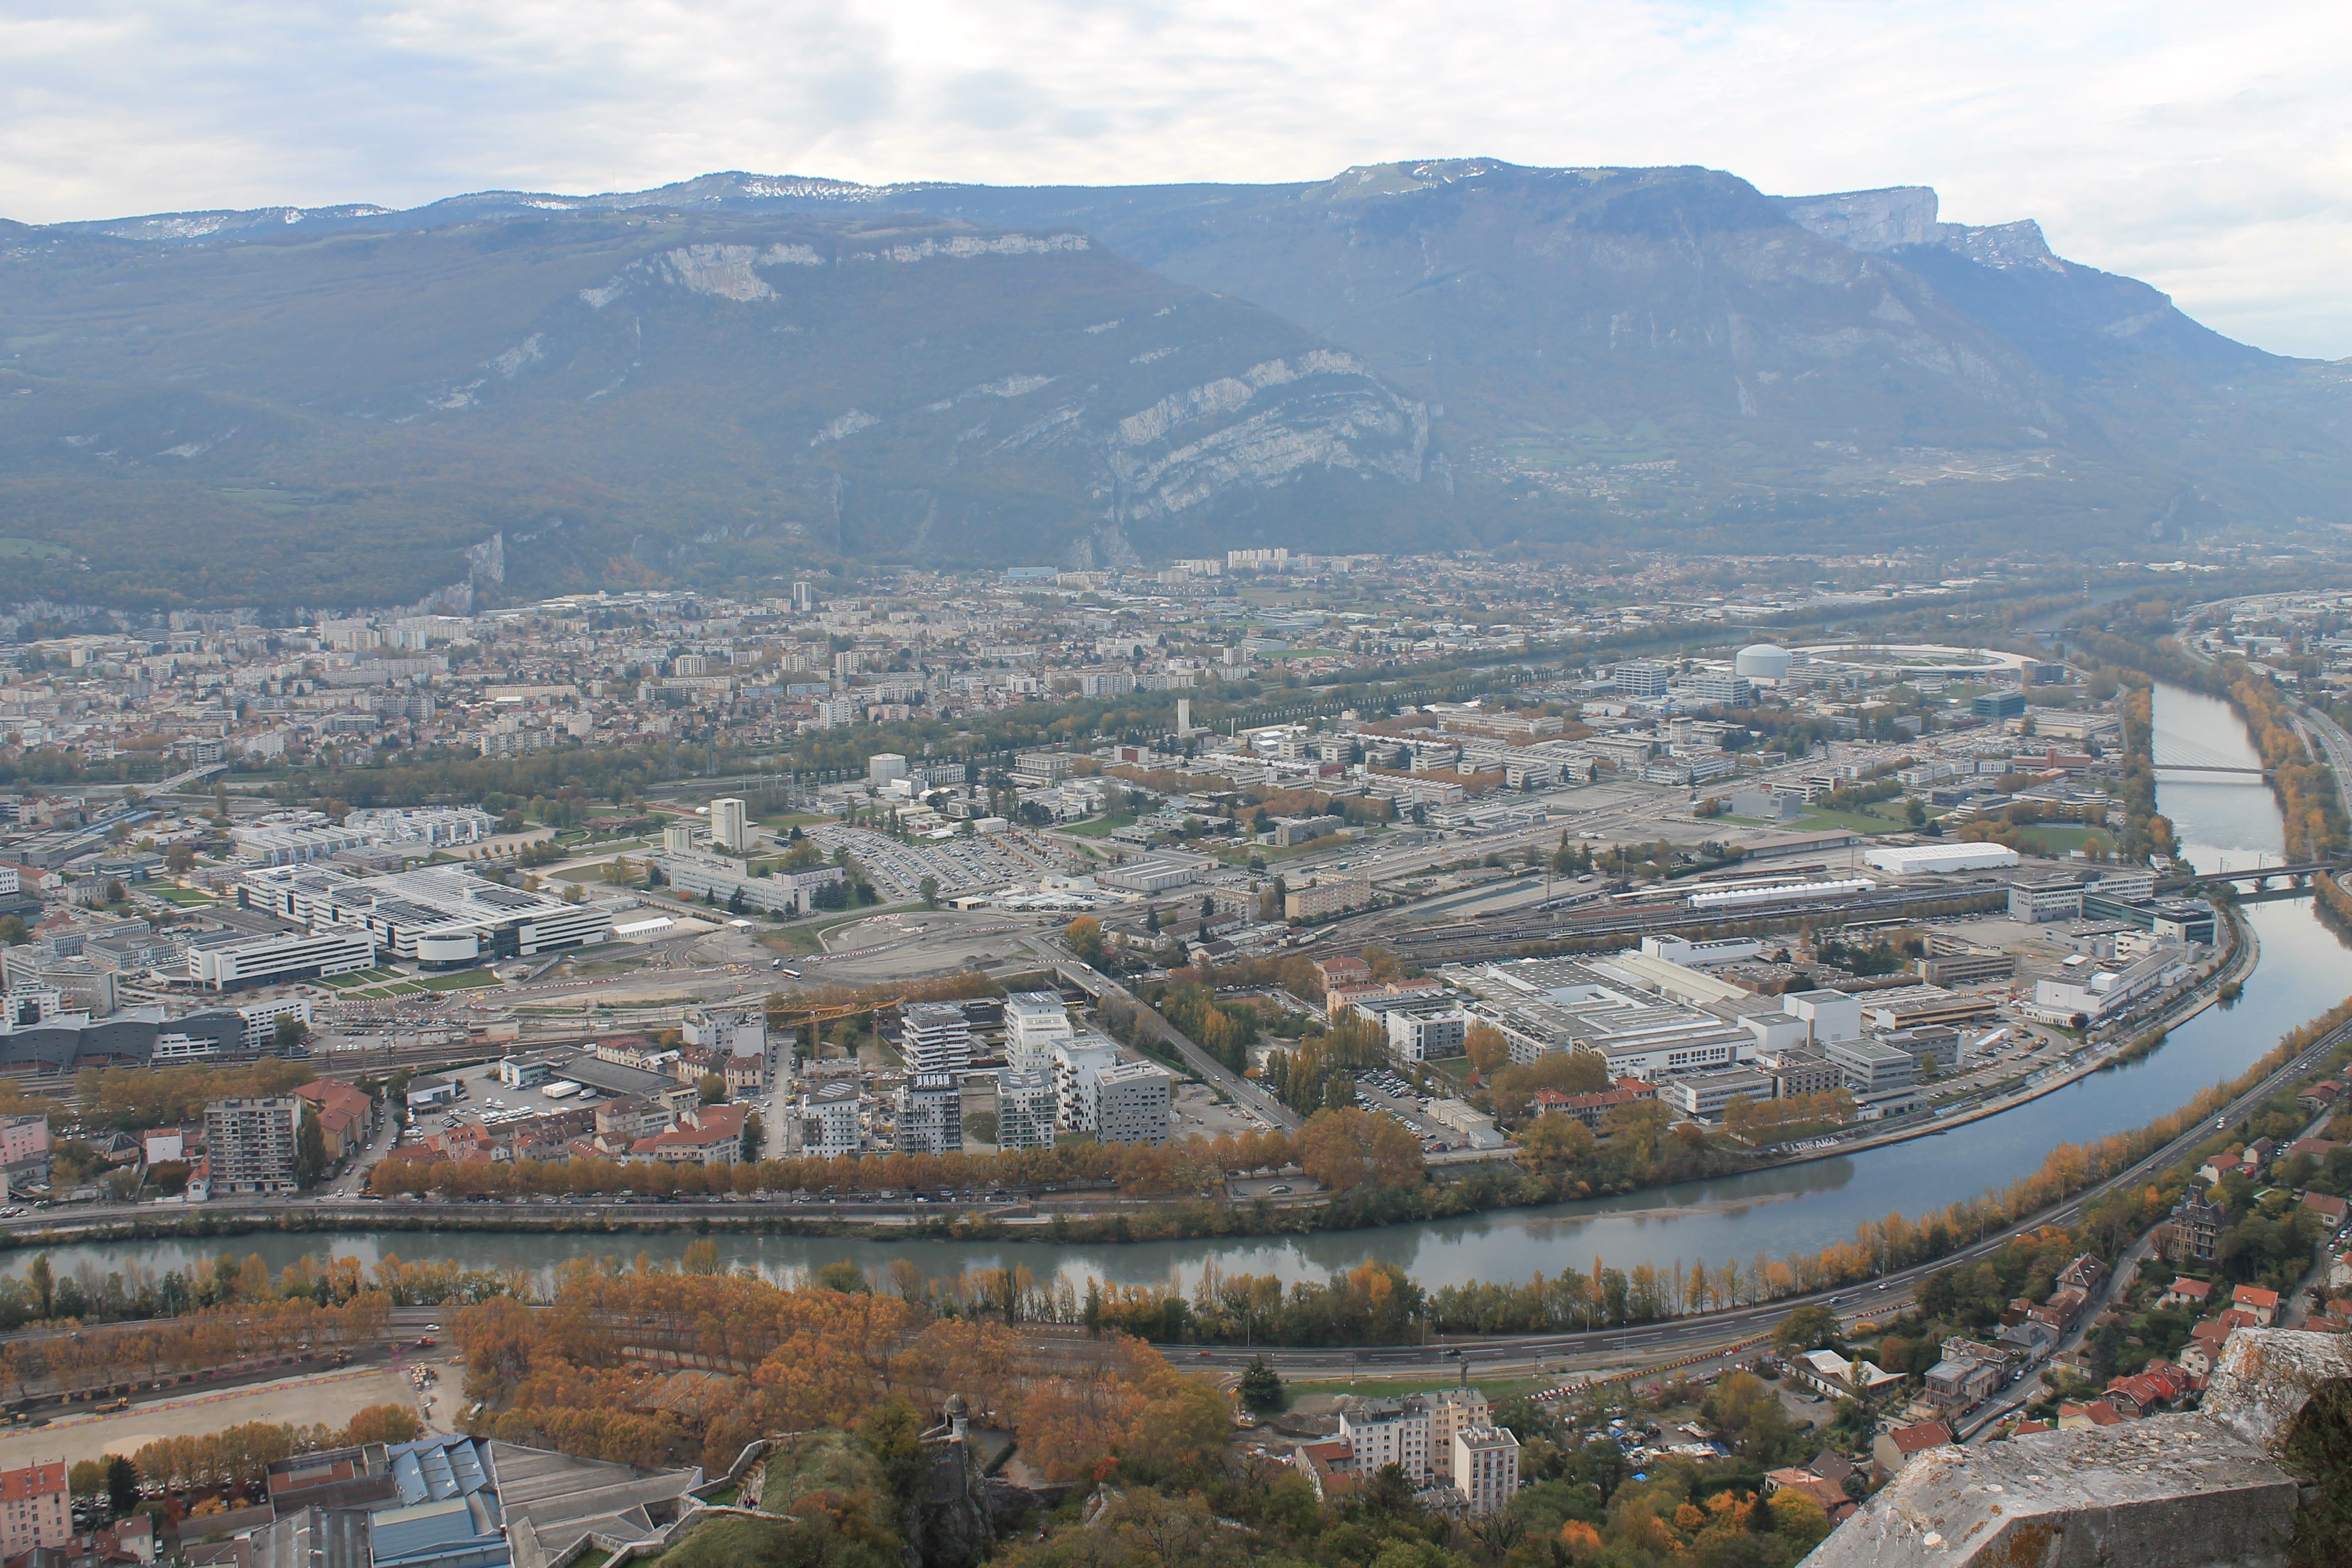 File:Presqu'île Grenoble.JPG - Wikimedia Commons